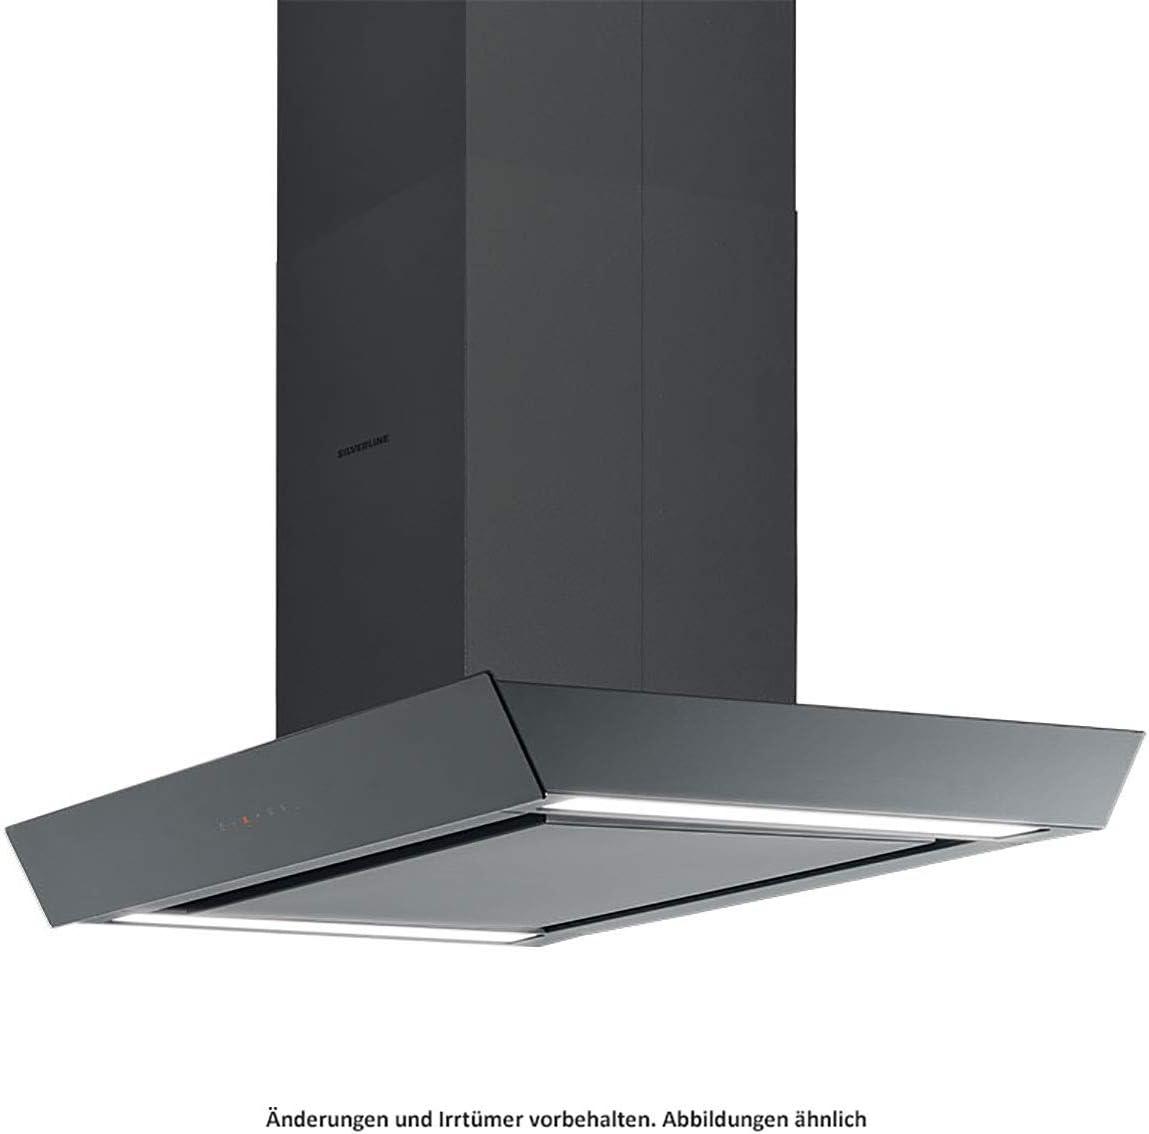 Silverline Vela Isola Premium VAI 120 S - Capota isla (cristal, 120 cm), color negro: Amazon.es: Grandes electrodomésticos